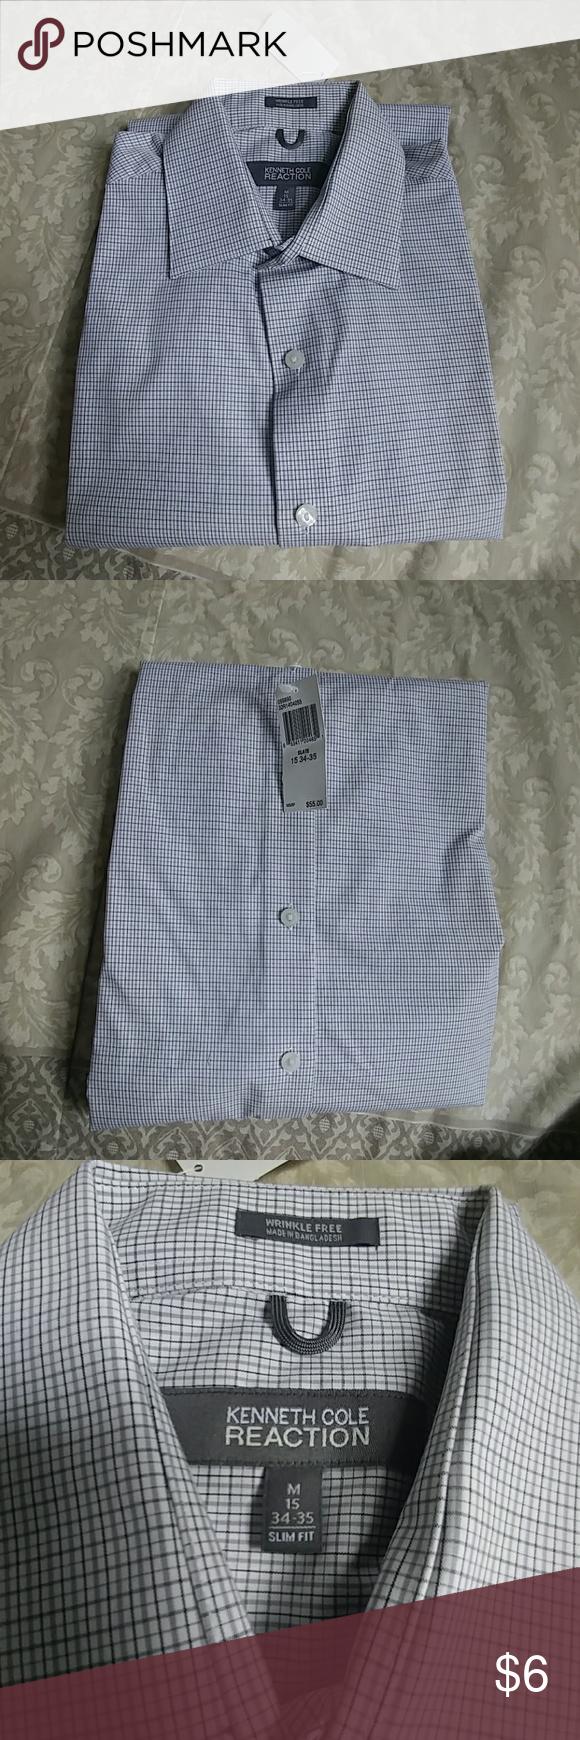 Kenneth cole reaction menus shirt nwt menus long sleeve dress shirt